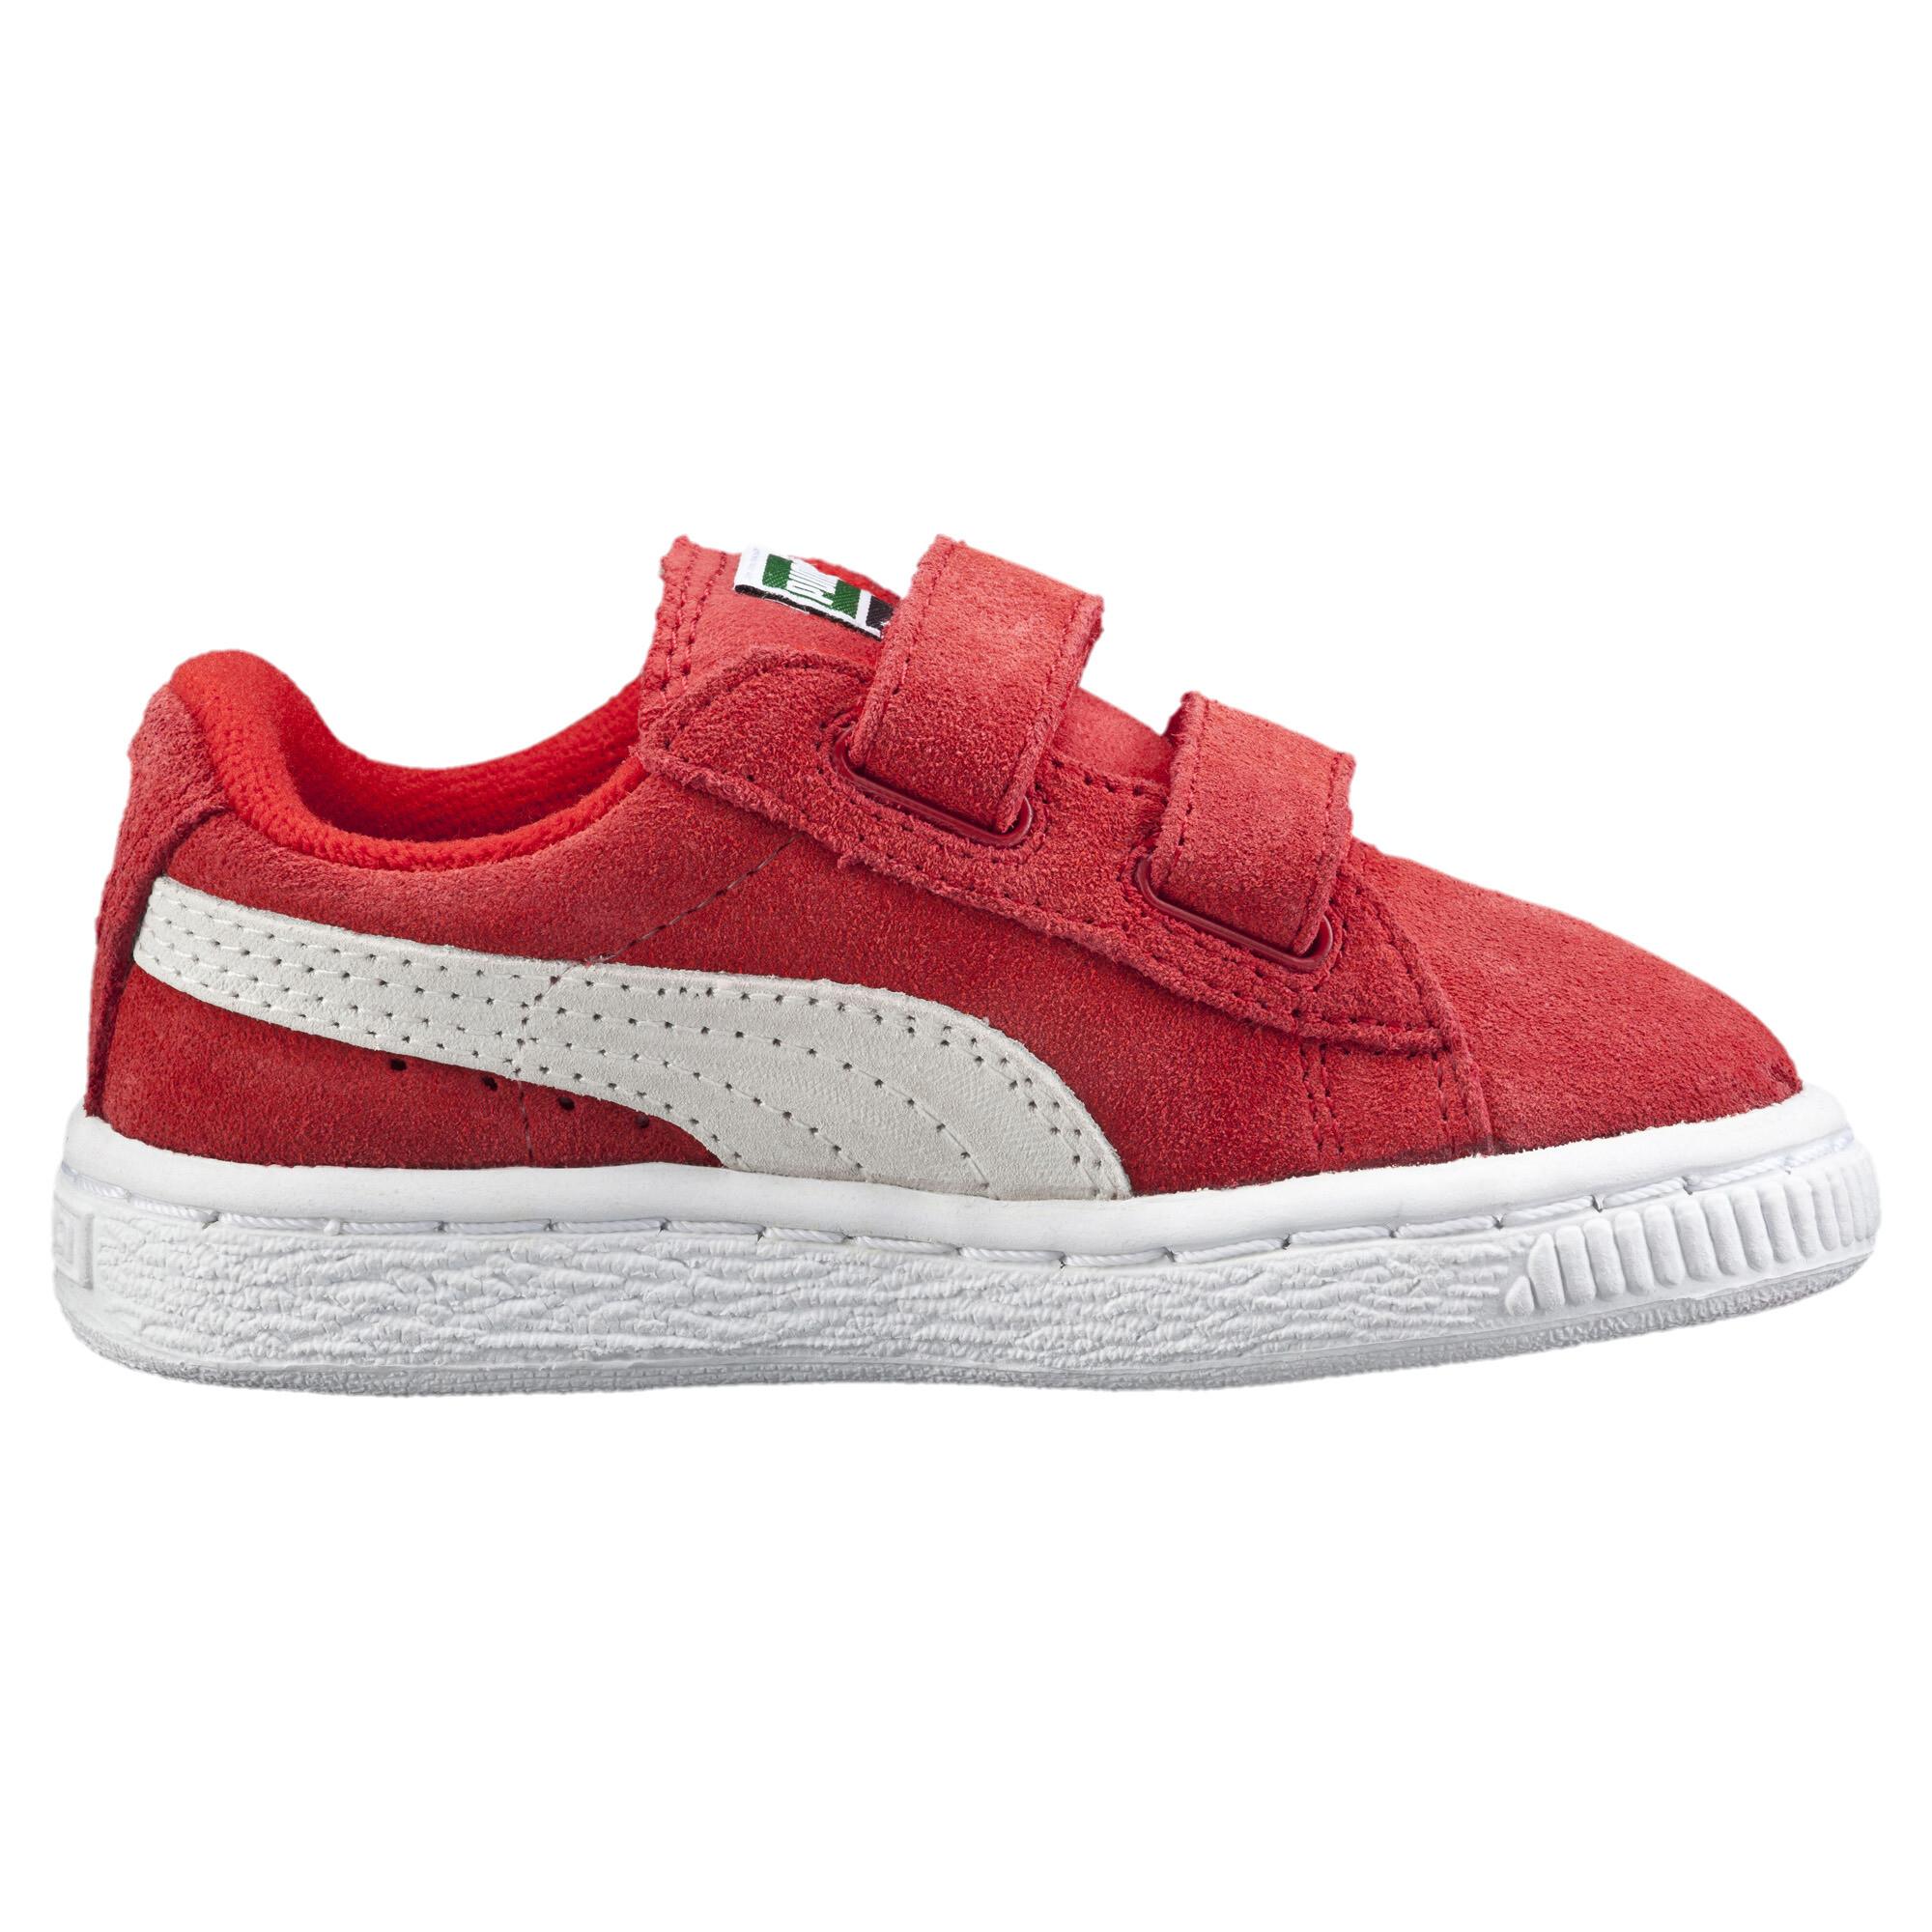 PUMA-Suede-AC-Toddler-Shoes-Kids-Shoe-Kids thumbnail 5